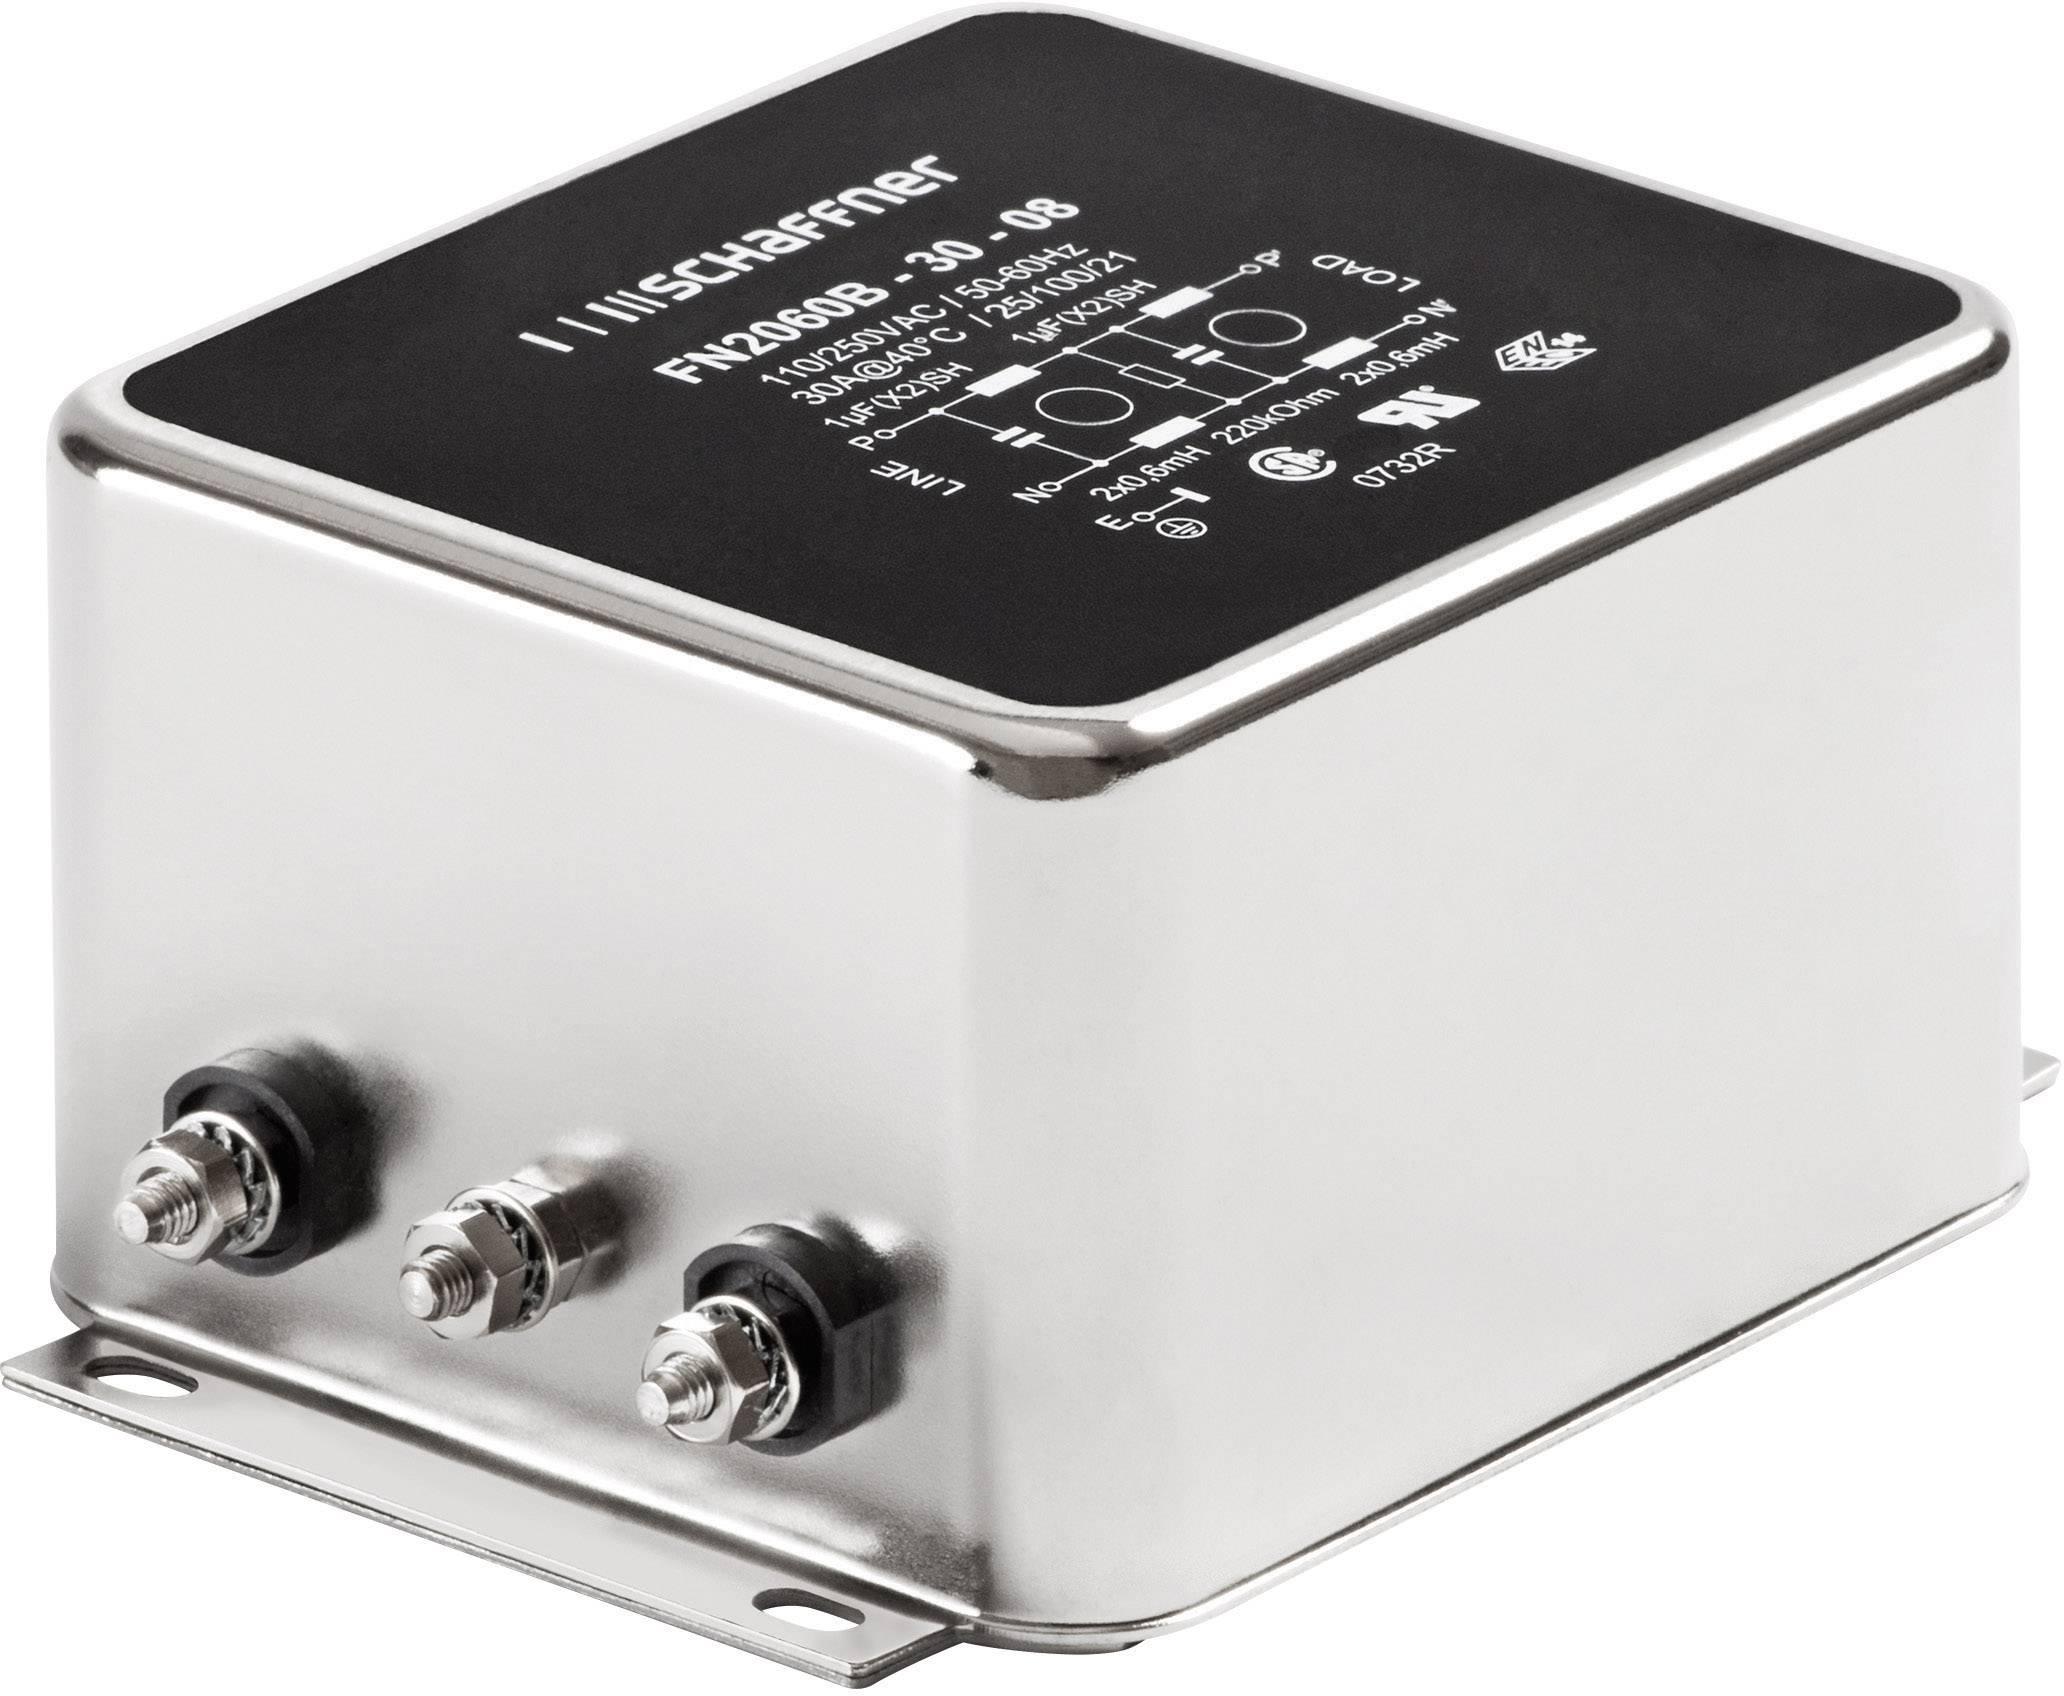 Odrušovací filter Schaffner FN 2060-1-06 FN 2060-1-06, 250 V/AC, 1 A, 12 mH, (š x v) 71 mm x 46.6 mm, 1 ks